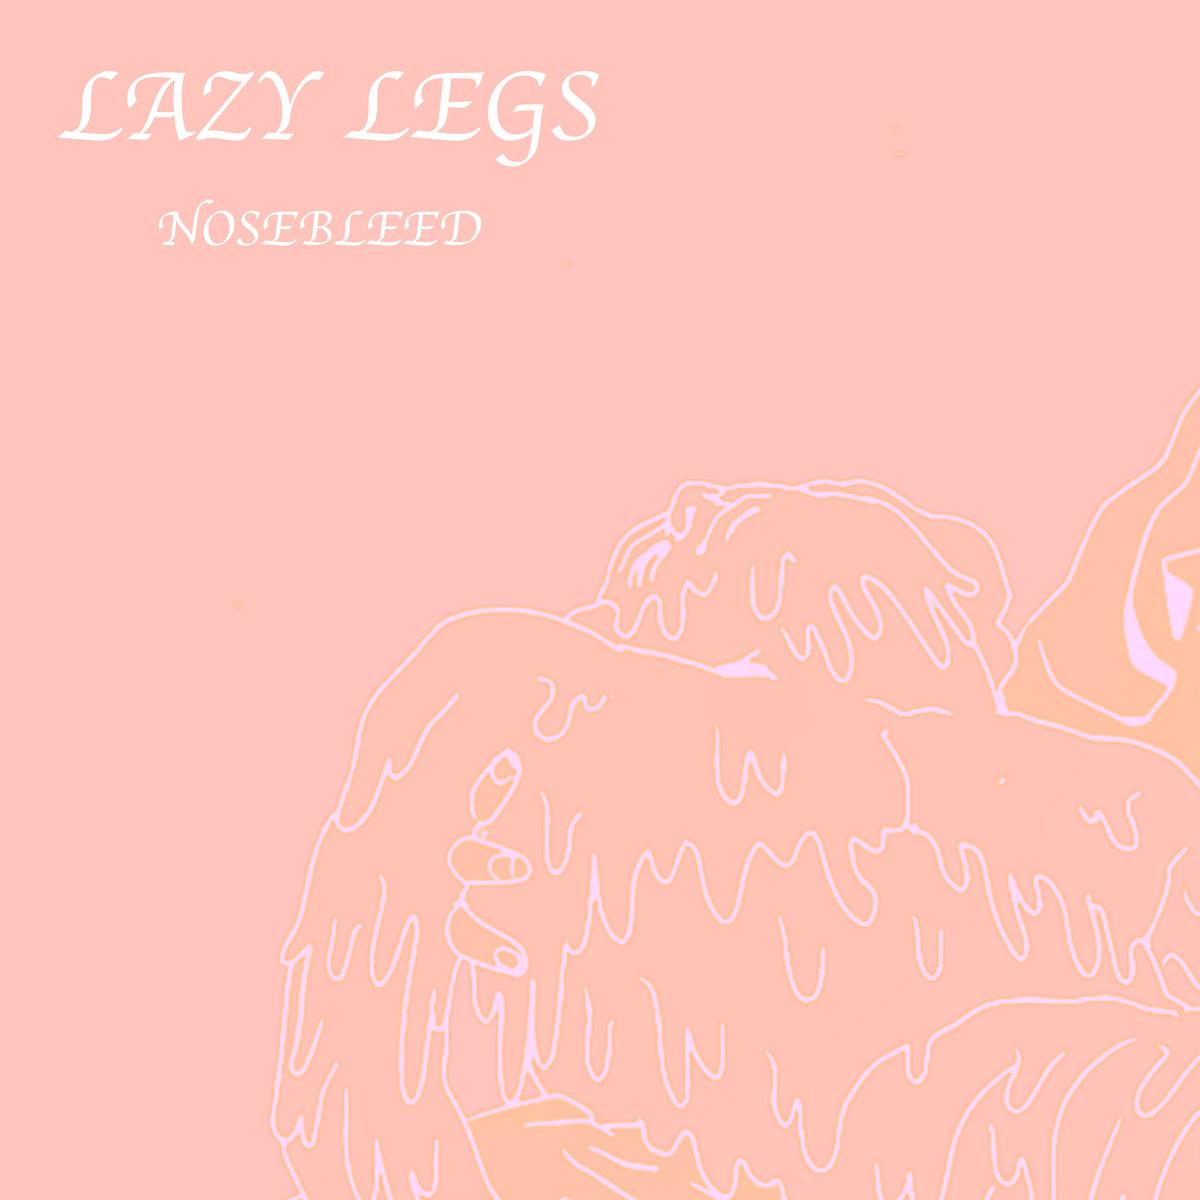 Lazy Legs - Portland-based gazey grunge duo.